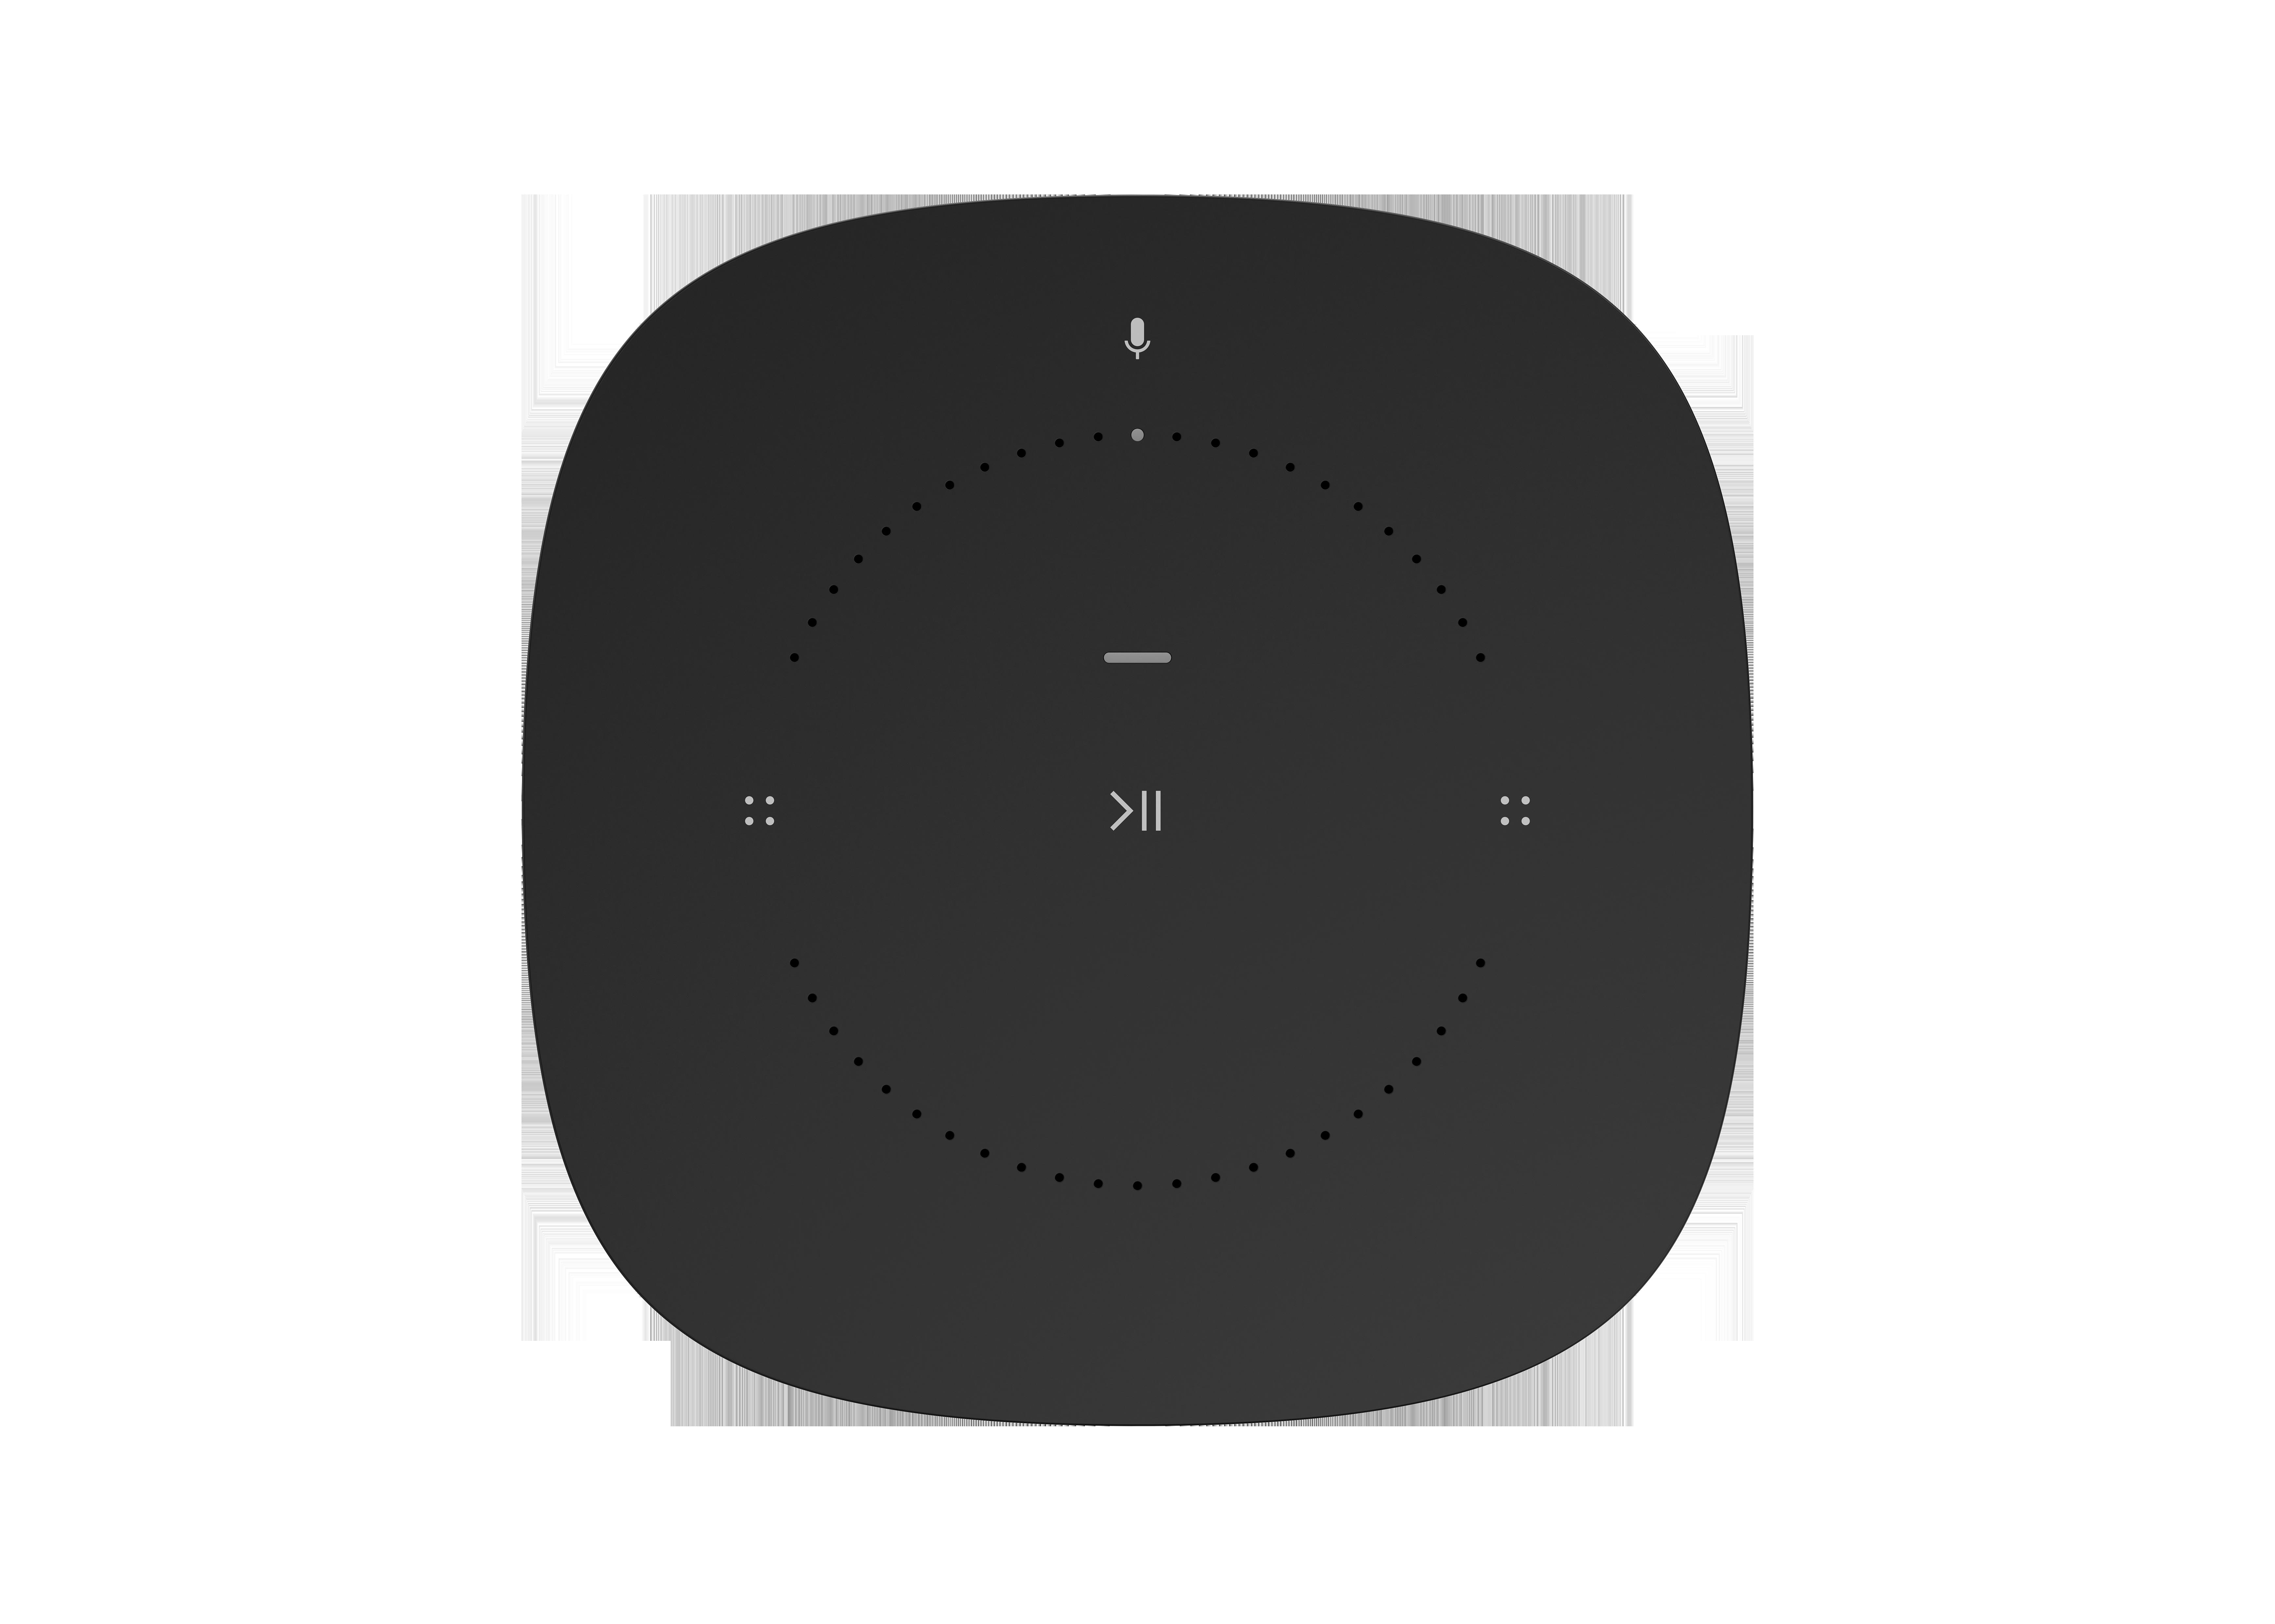 One_Black-Product_Render-Top-Q4FY19_MST-MST_fid51608